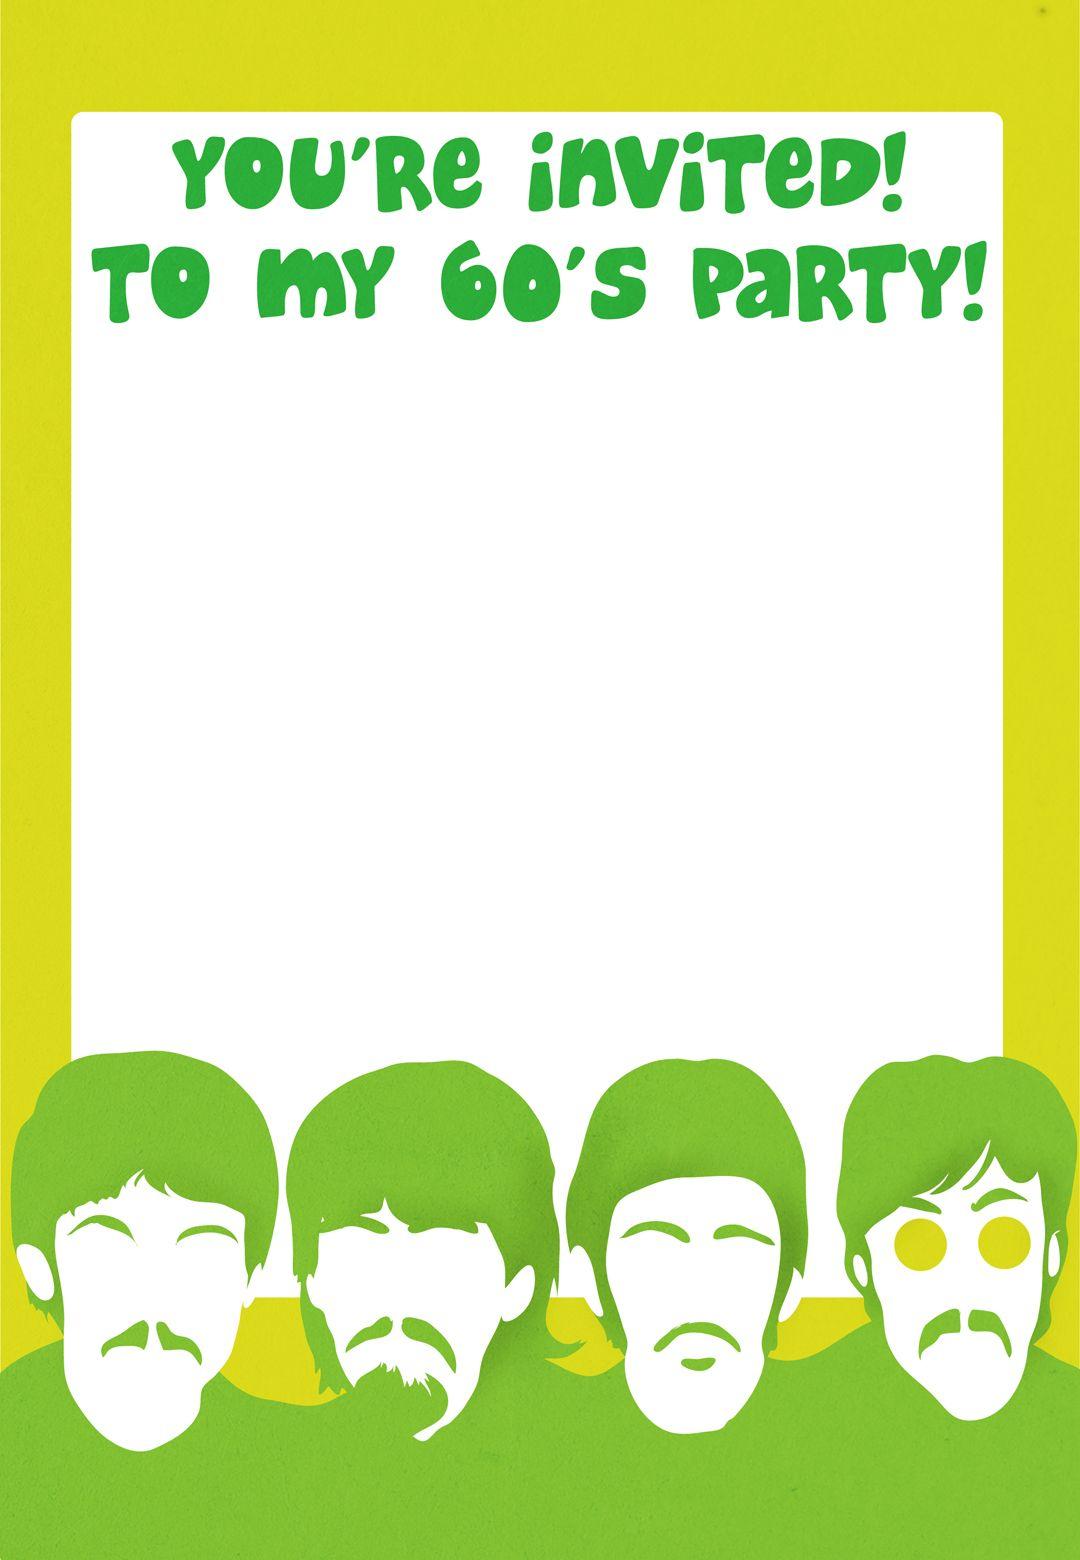 Free Printable 60S Party Invitation | 60s | Pinterest ...